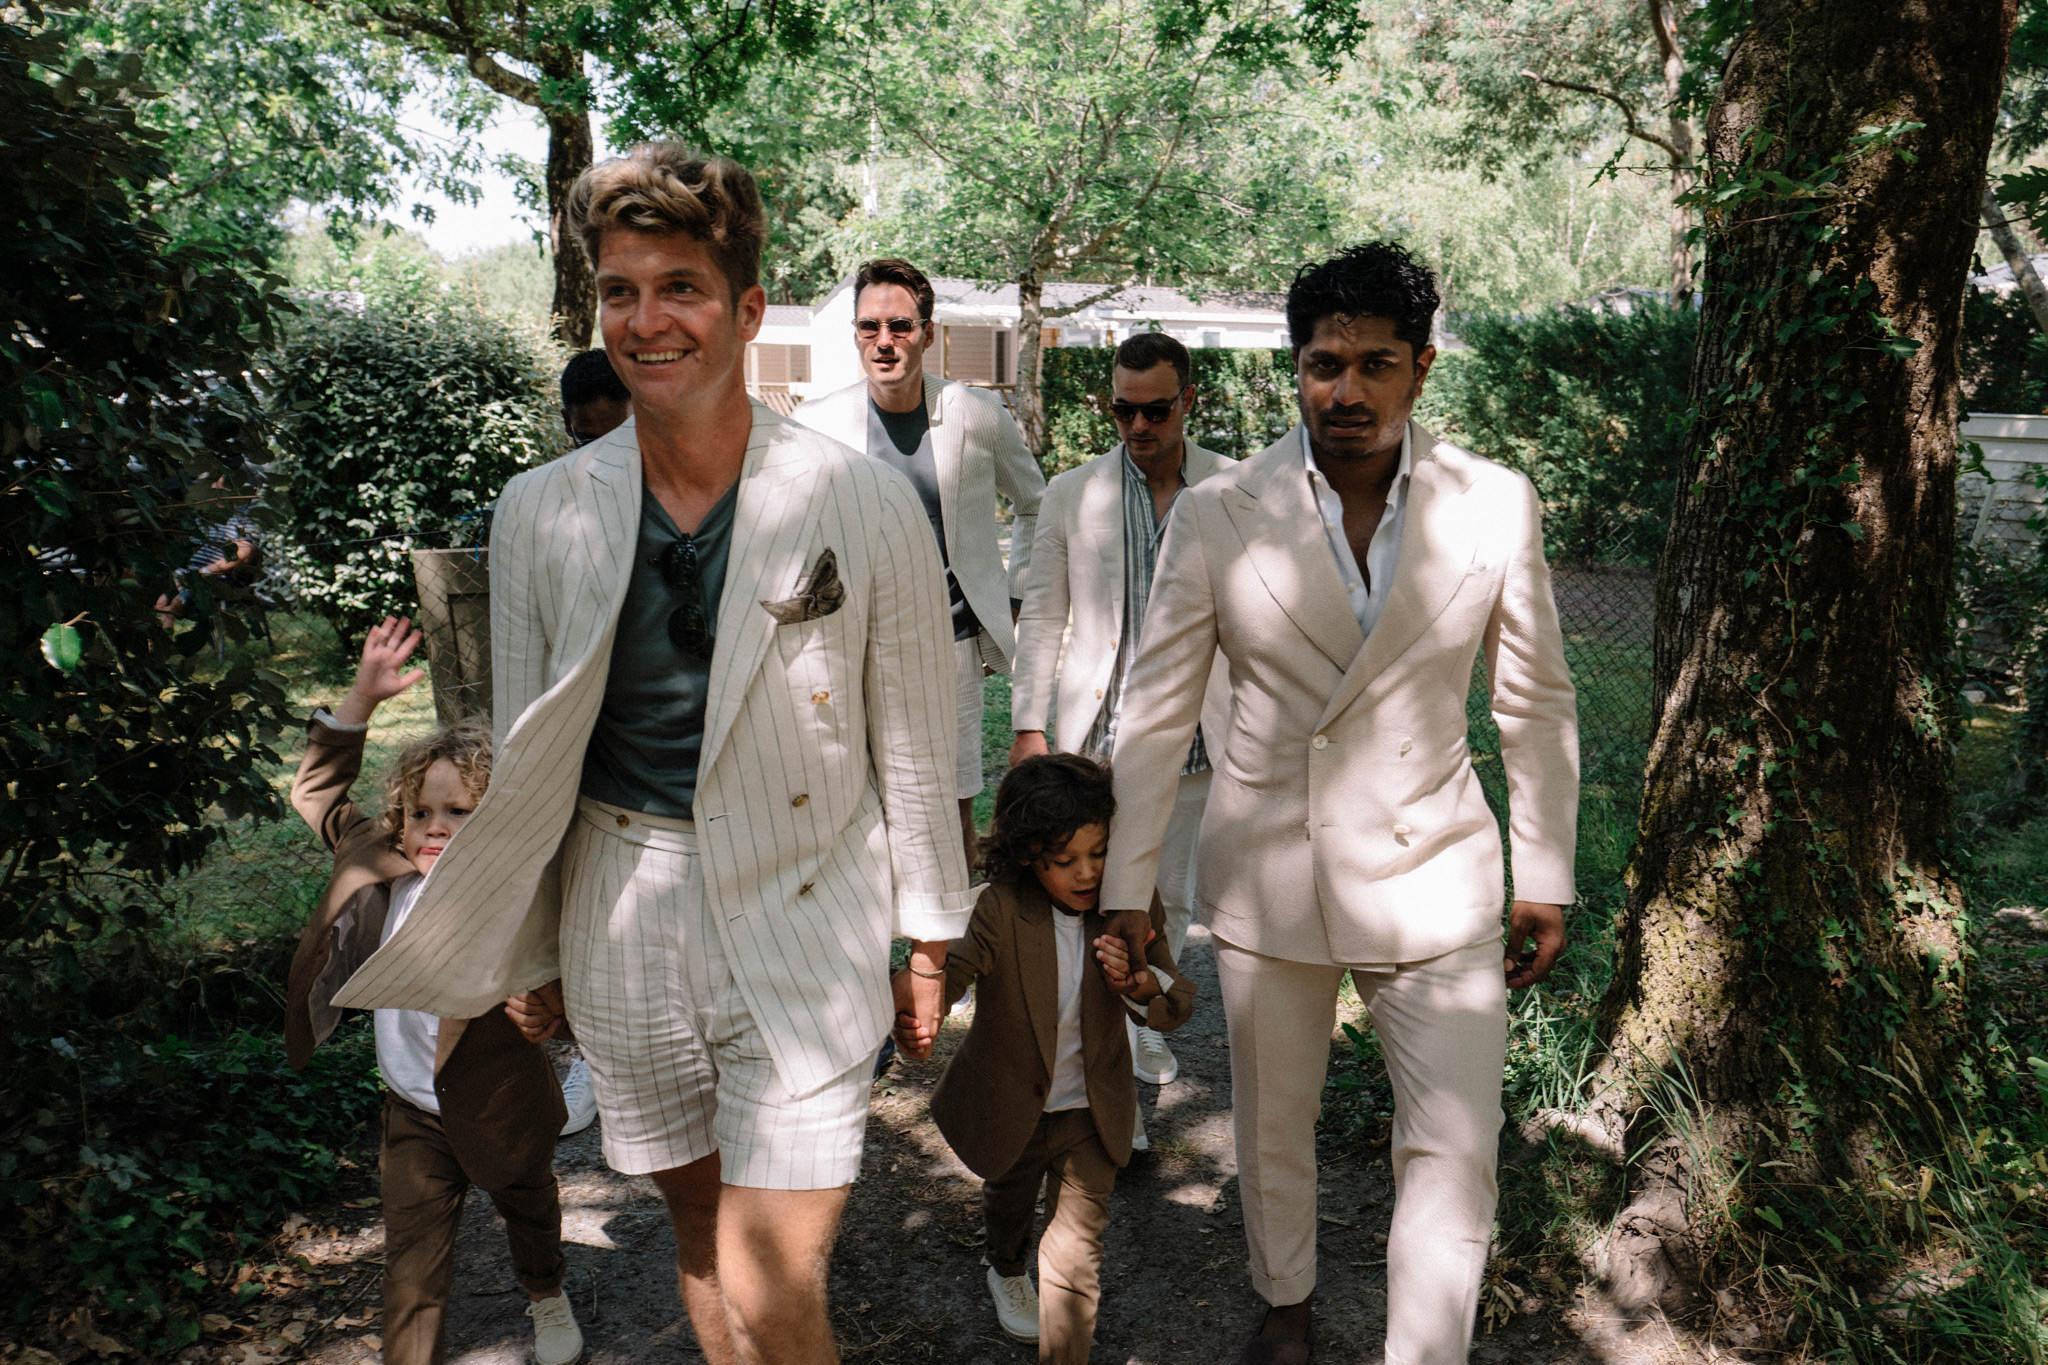 wedding-destination-bordeaux-france-boys-sparkly